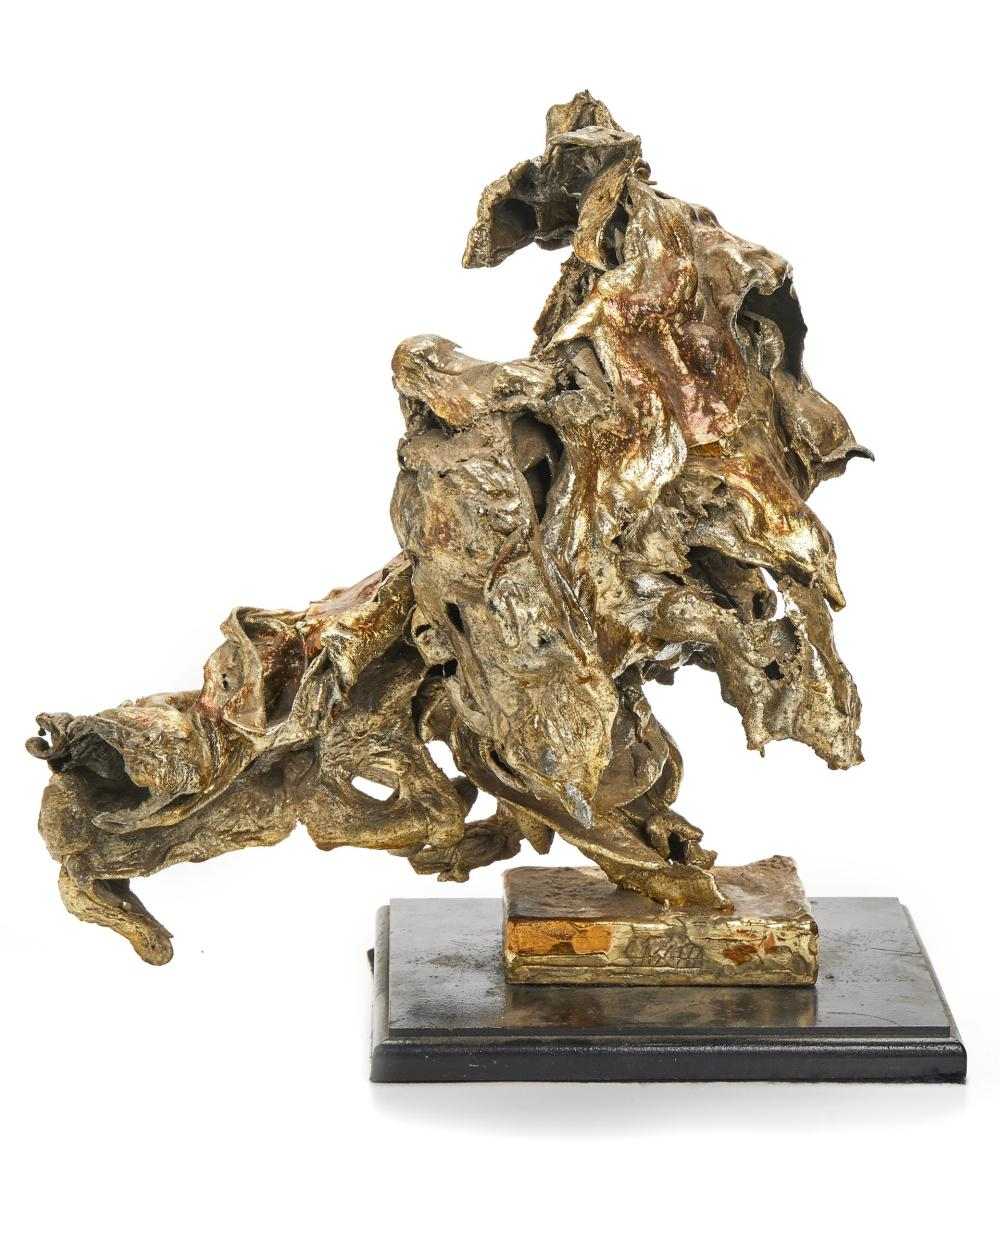 Sascha Brastoff, (1918-1993, American), Freeform sculpture, Mixed media on wood base, Overall: 13.75